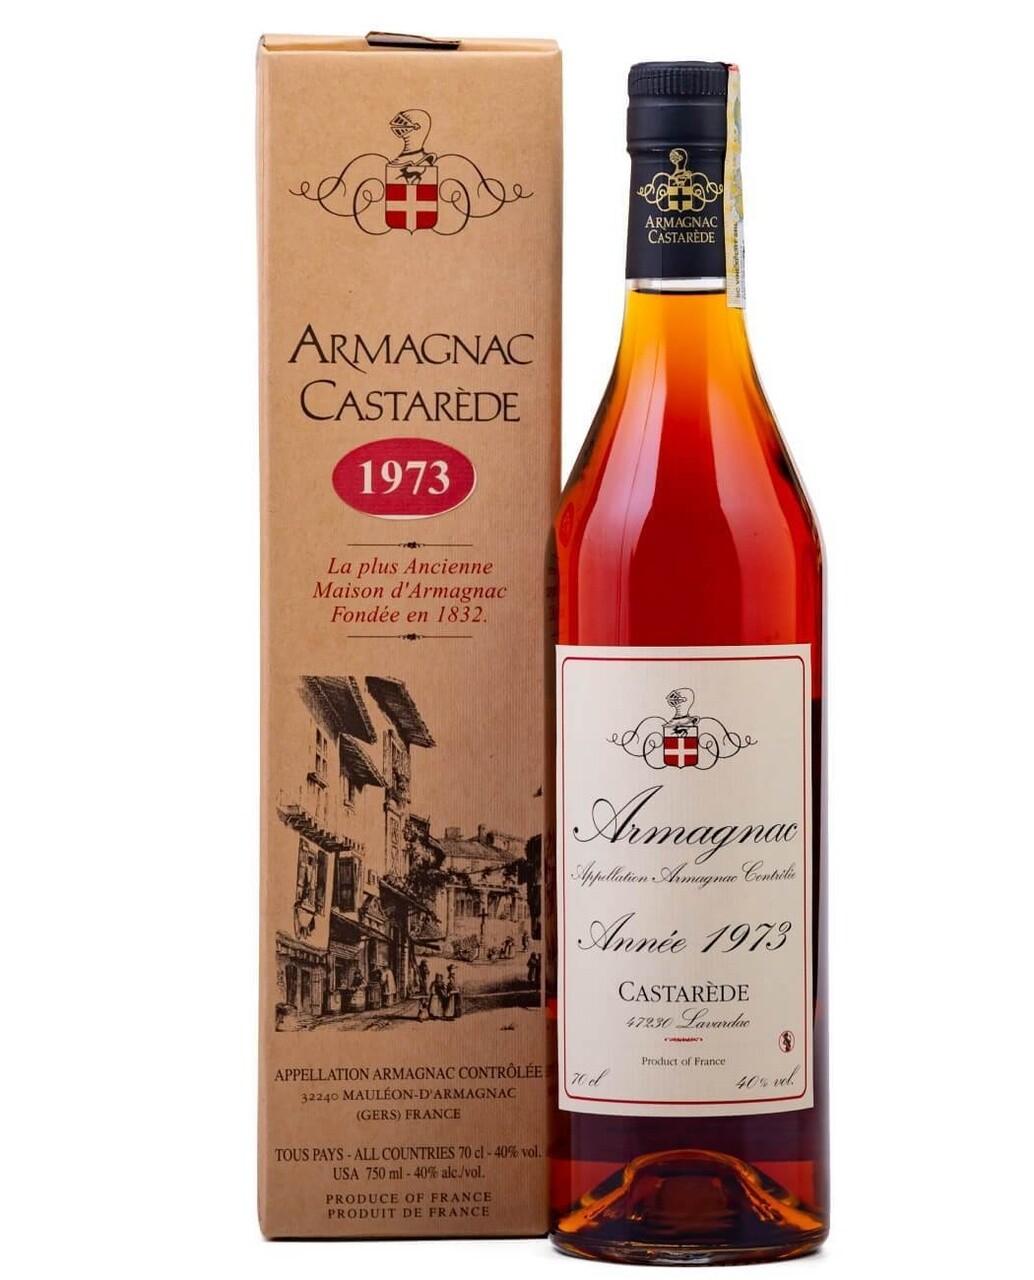 Armagnac Castarede 1973 0.5L